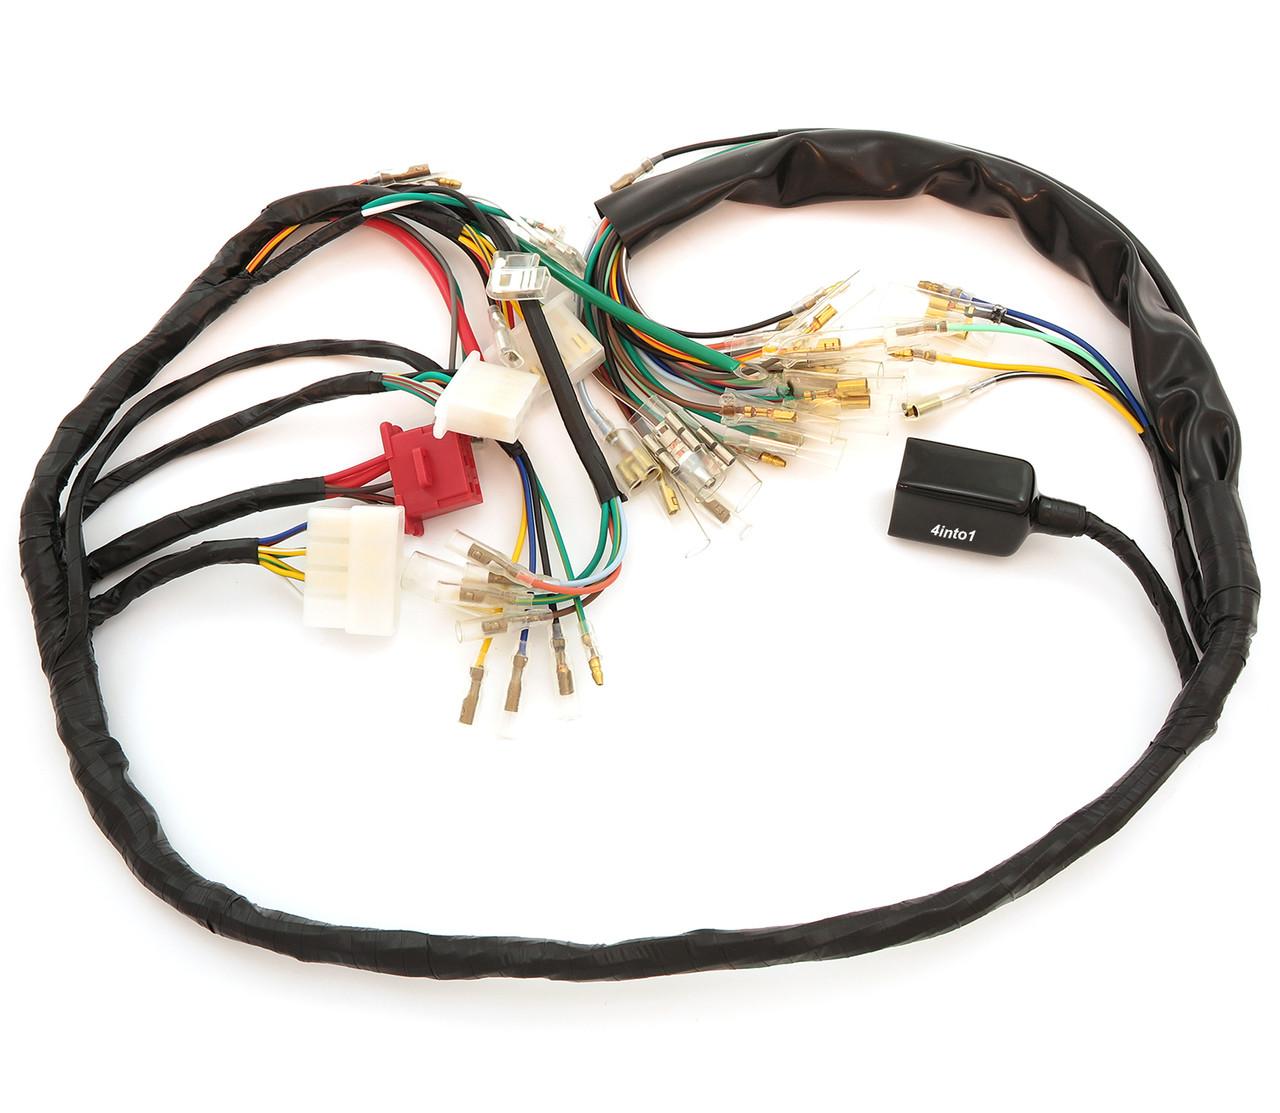 main wiring harness 32100 341 703 honda cb750k 1973 1975. Black Bedroom Furniture Sets. Home Design Ideas